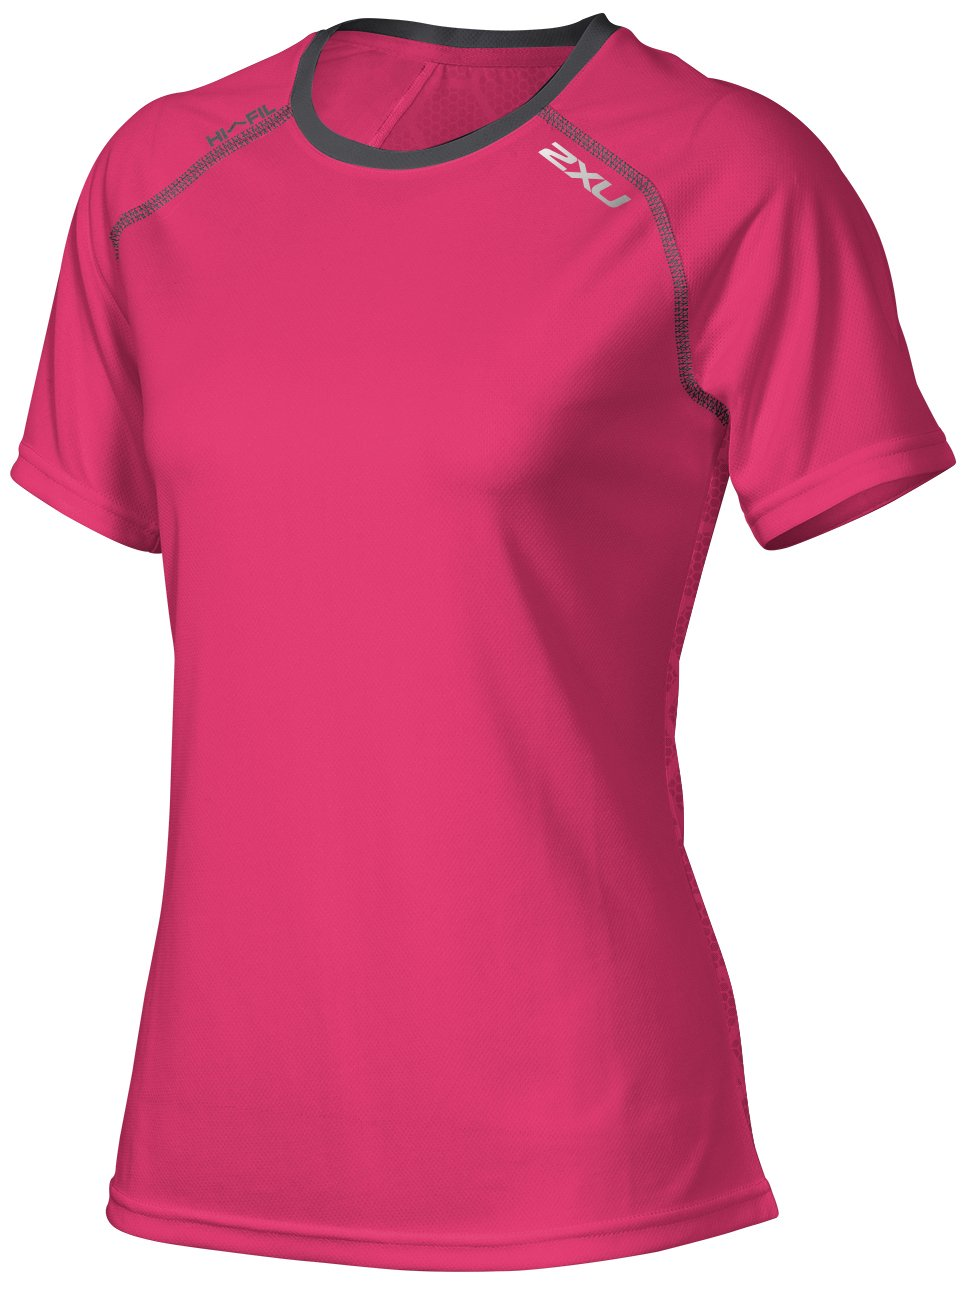 2XU Women's Tech Vent Short Sleeve Top